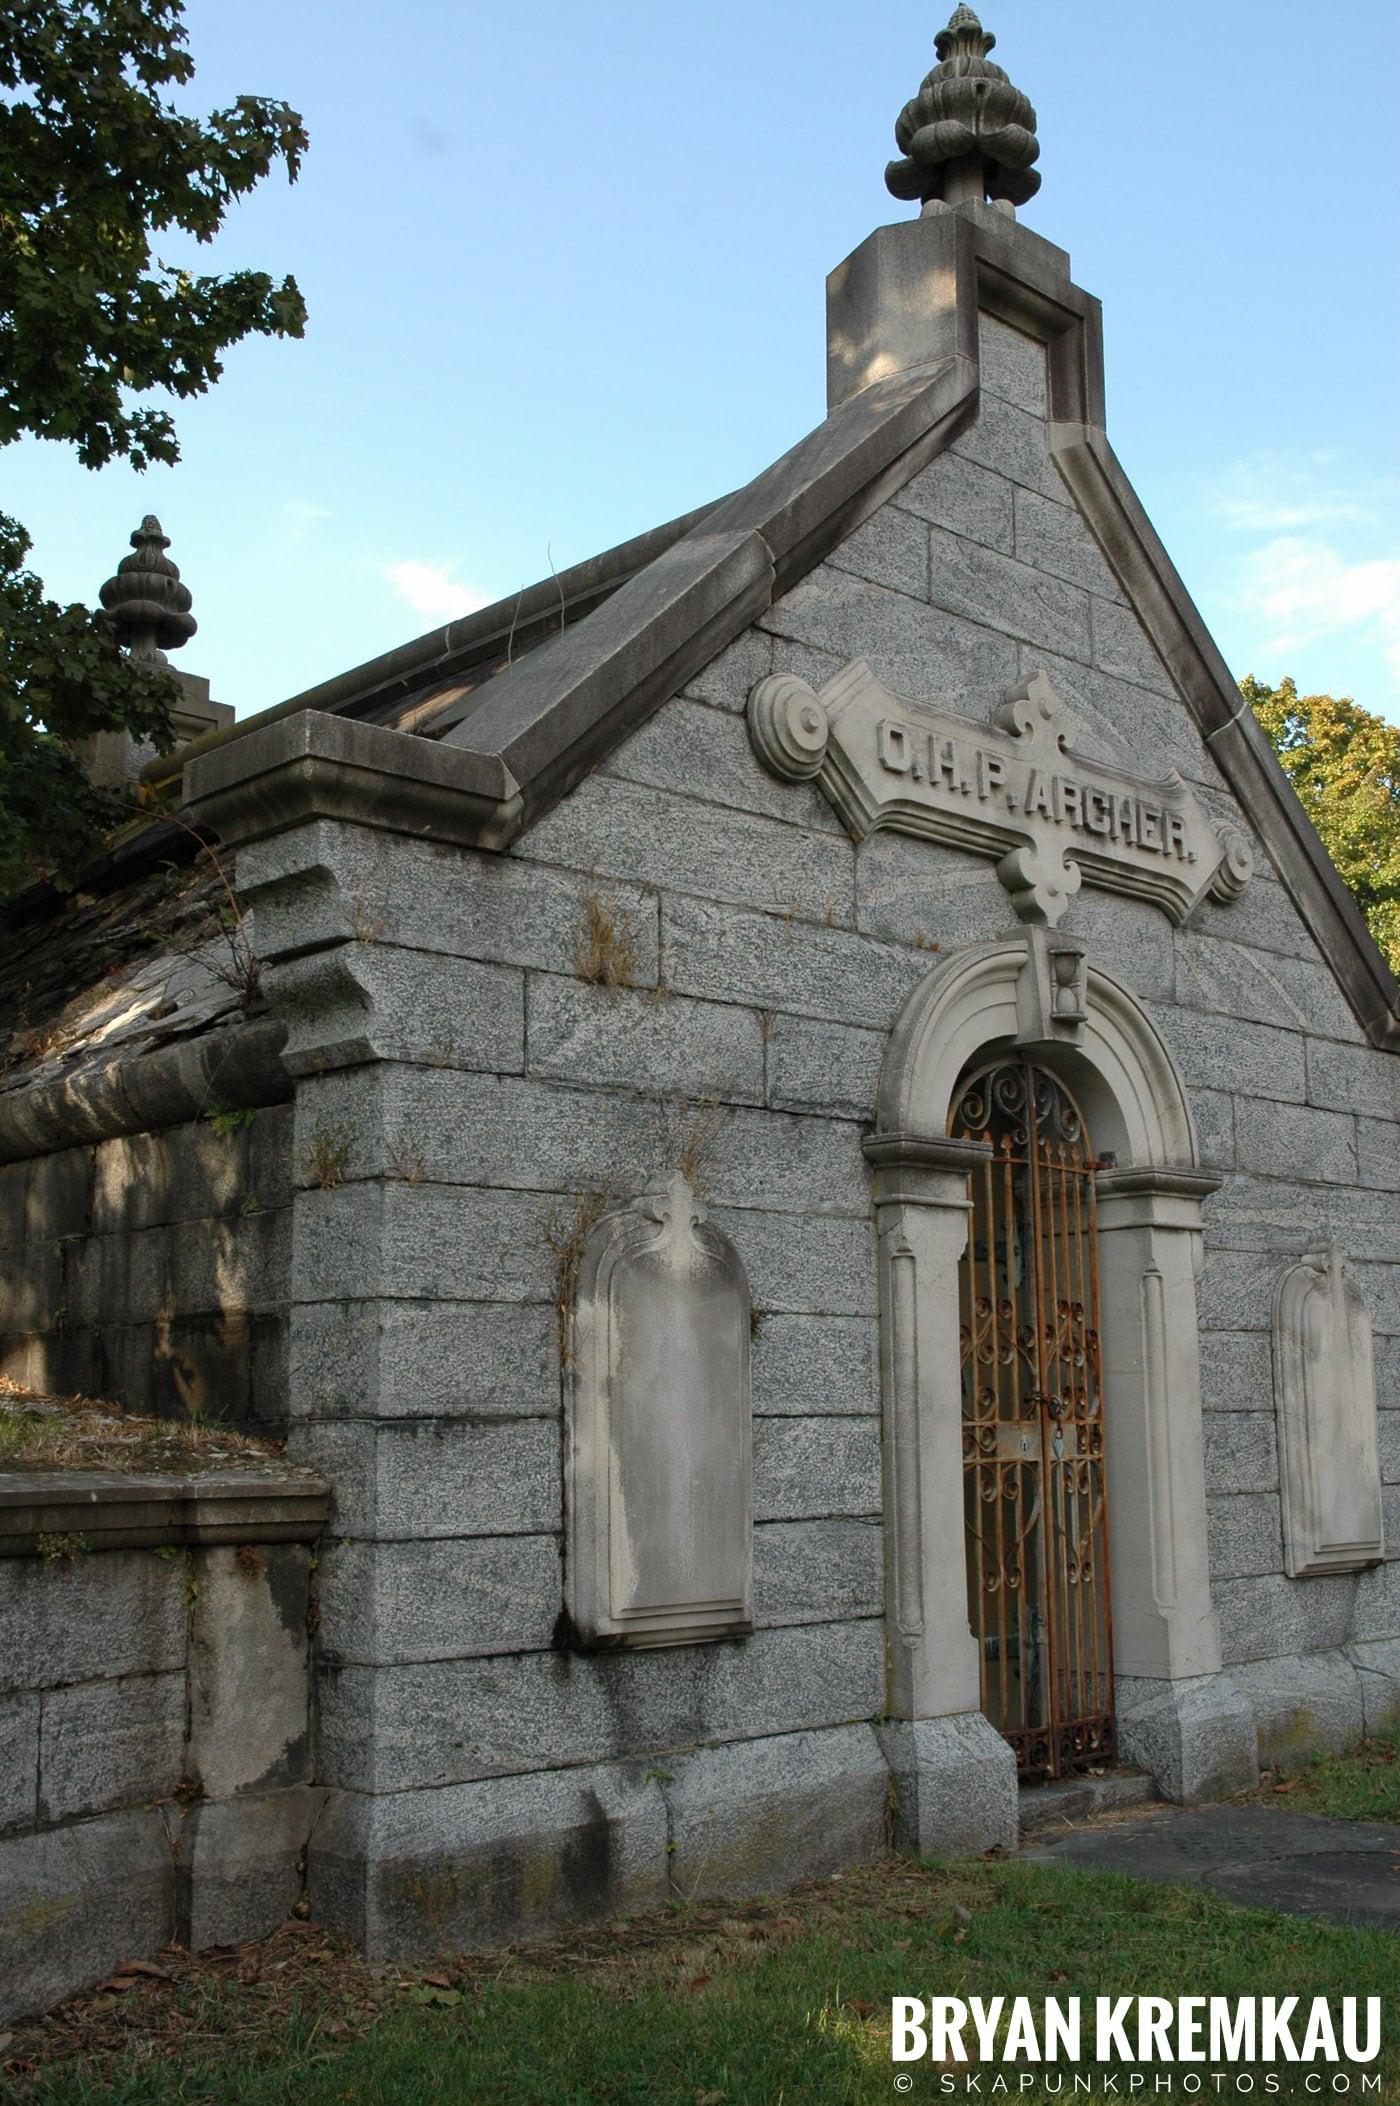 The Old Dutch Church & Lyndhurst Mansion @ Sleepy Hollow/Tarrytown, NY - 10.20.07 (17)